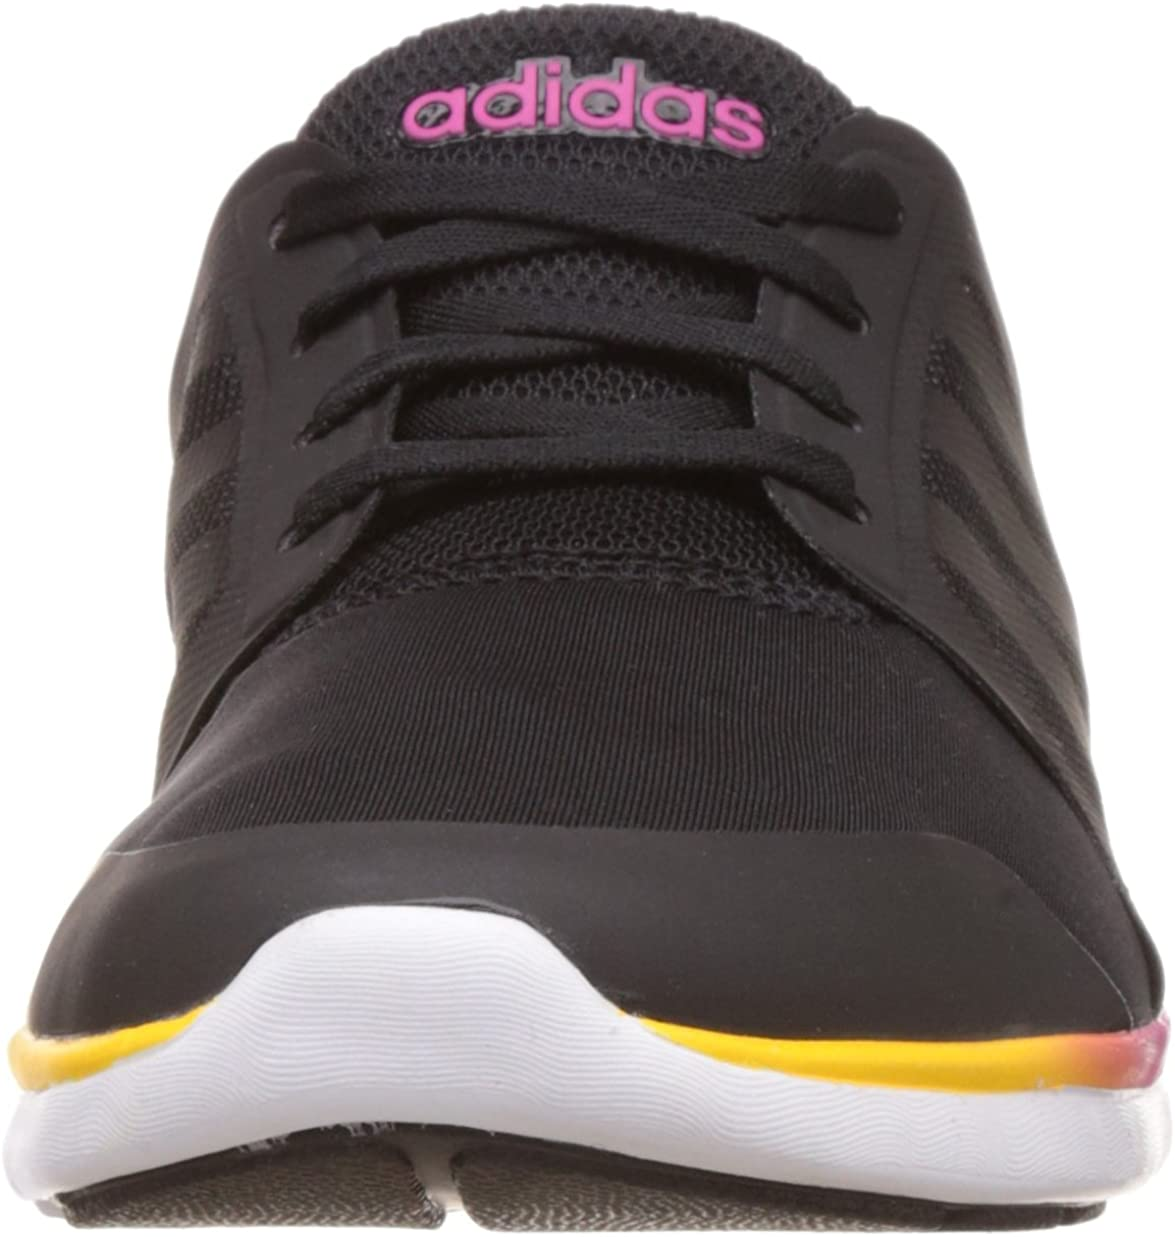 adidas Damen Cloudfoam Xpression W Fitnessschuhe